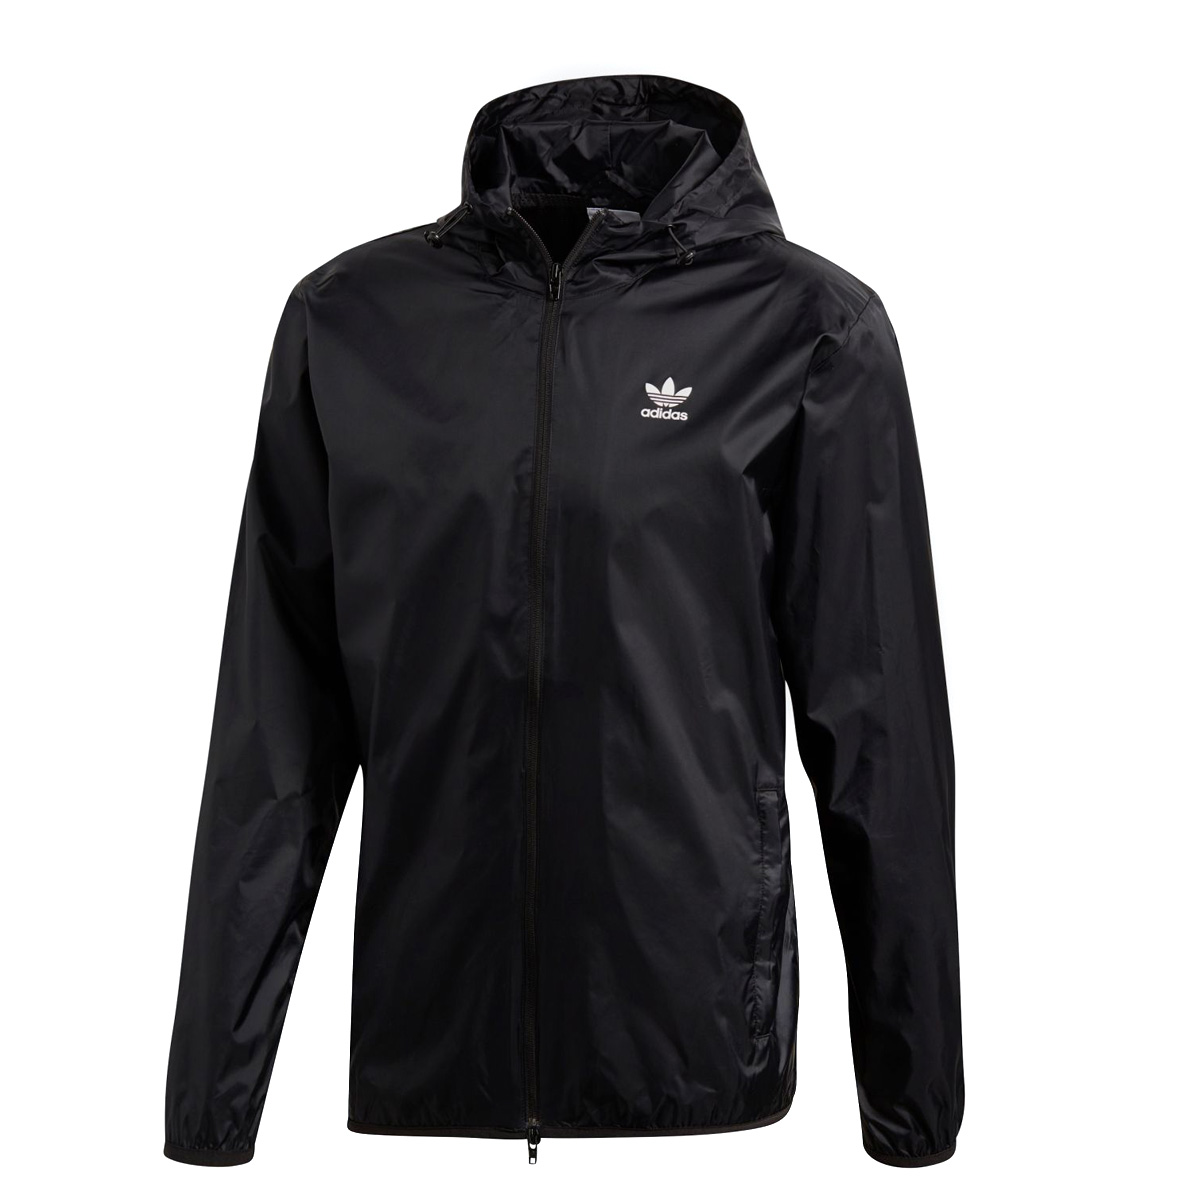 adidas Originals TREFOIL WINDBREAKER(アディダス オリジナルス トレフォイルウィンドブレーカー)BLACK【メンズ ジャケット】18FW-I